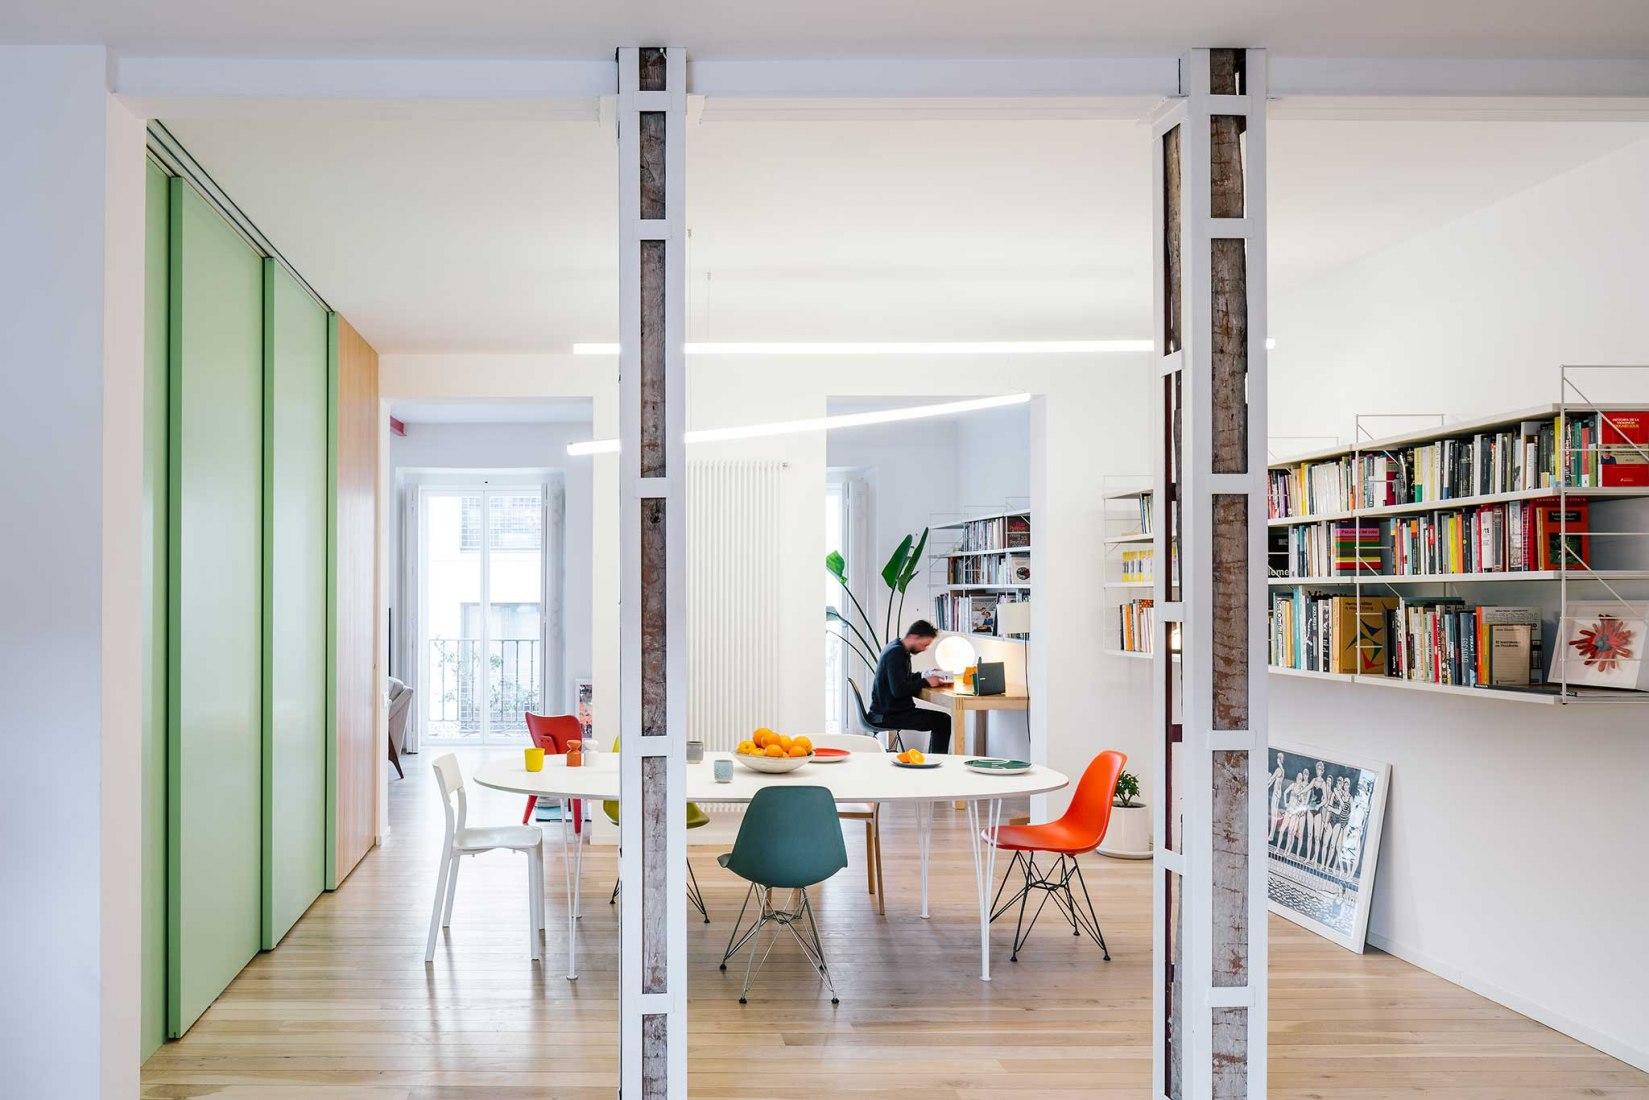 Sequence House por Gon Architects y Ana Torres. Fotografía por Imagen Subliminal (Miguel de Guzmán + Rocío Romero)